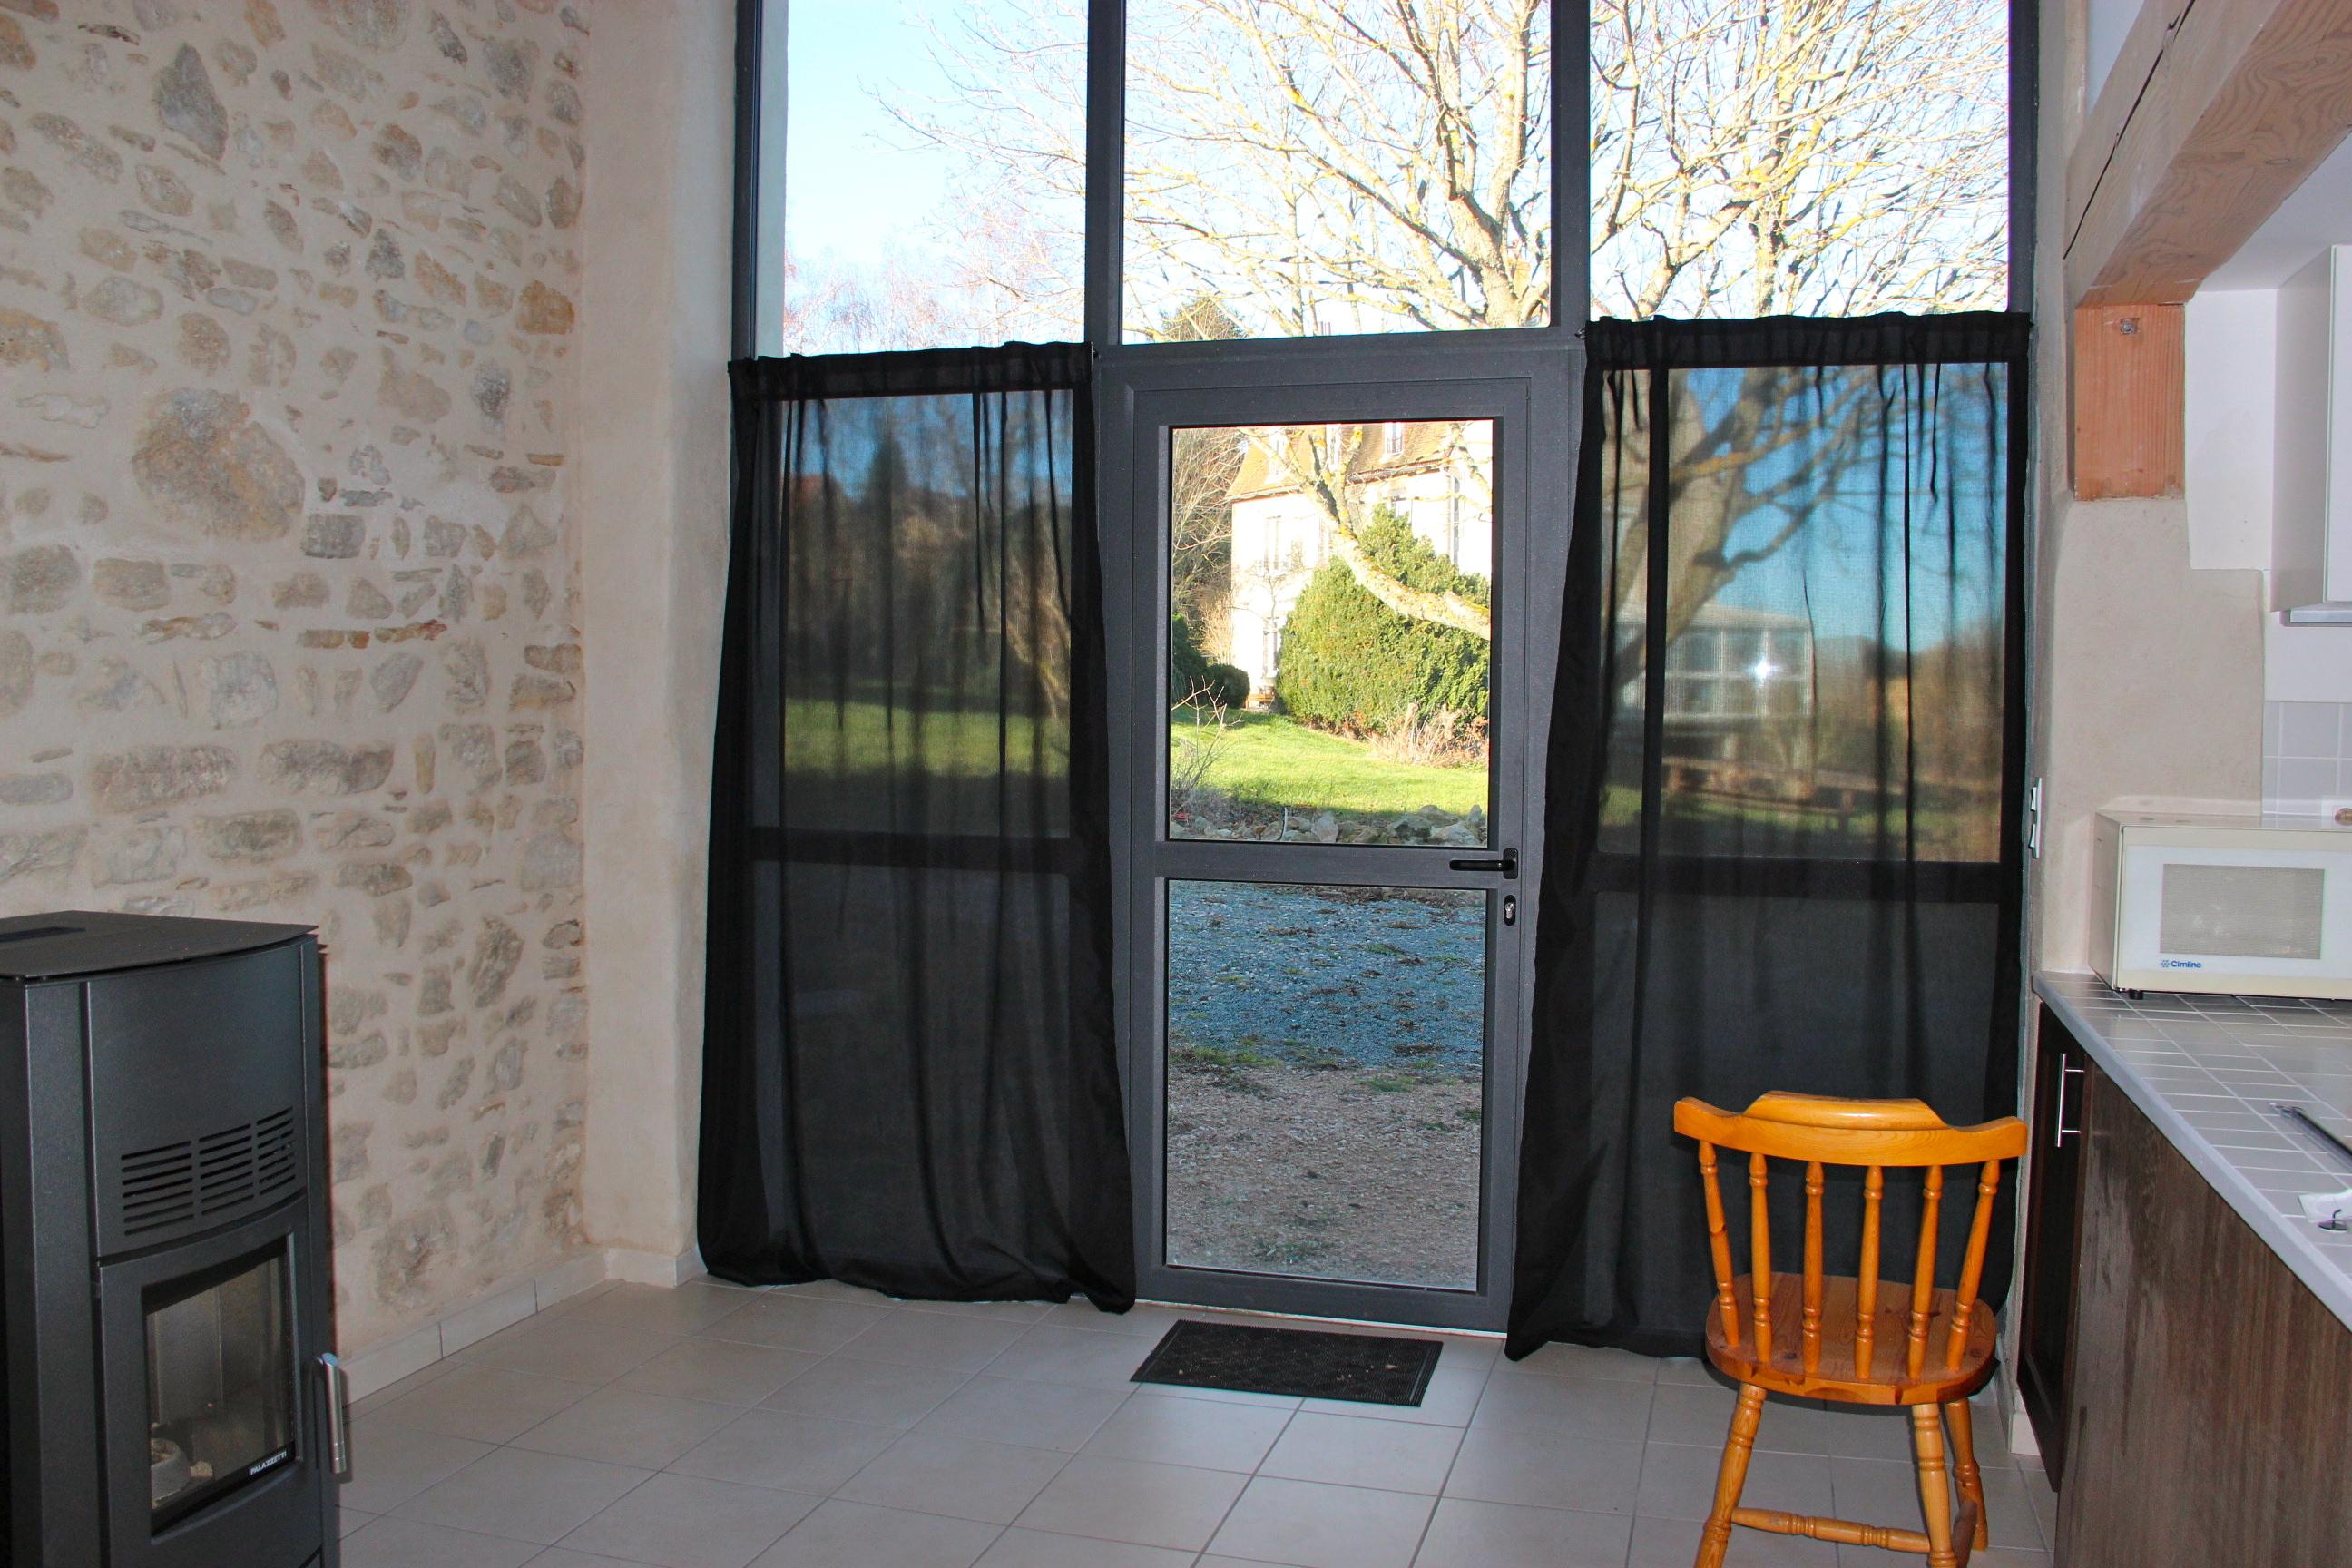 free pendant u u et with rideaux ikea velours. Black Bedroom Furniture Sets. Home Design Ideas